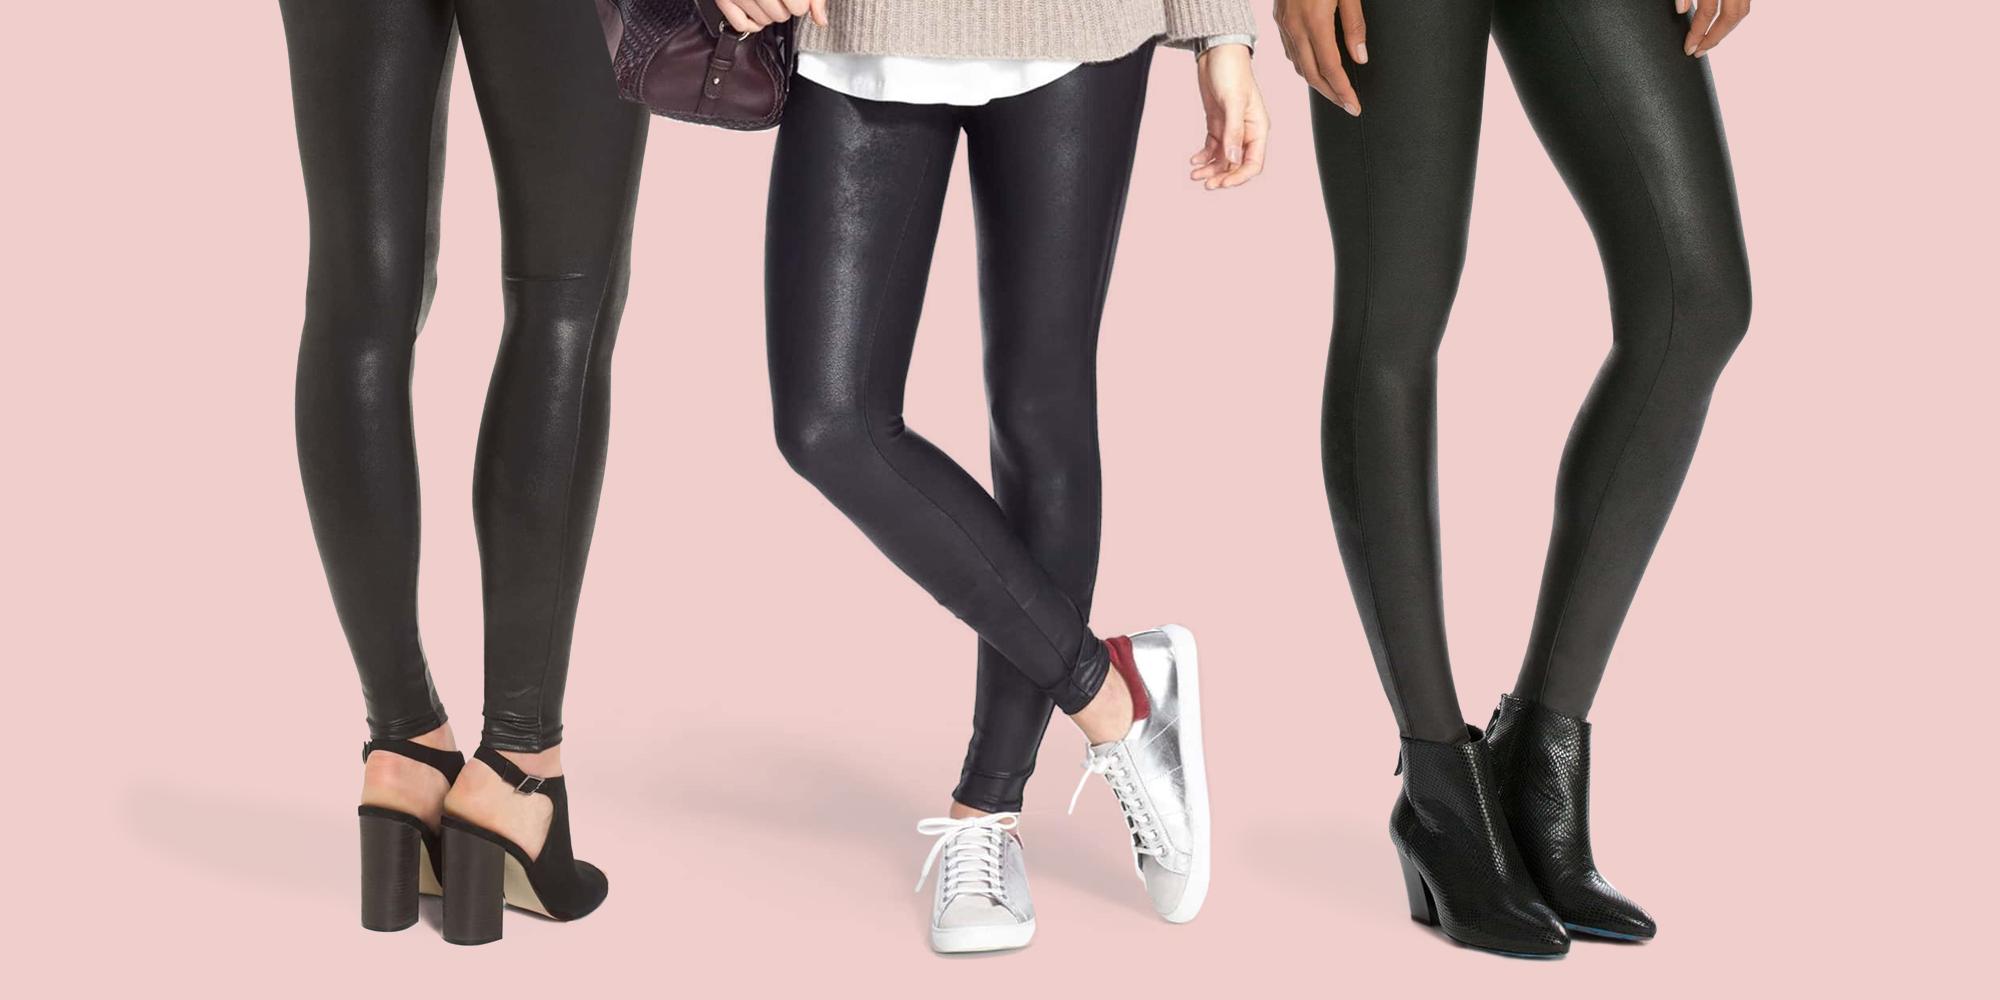 Black 6-8 Spanx Faux Leather High Waist Slimming Control Top Pants Leggings M